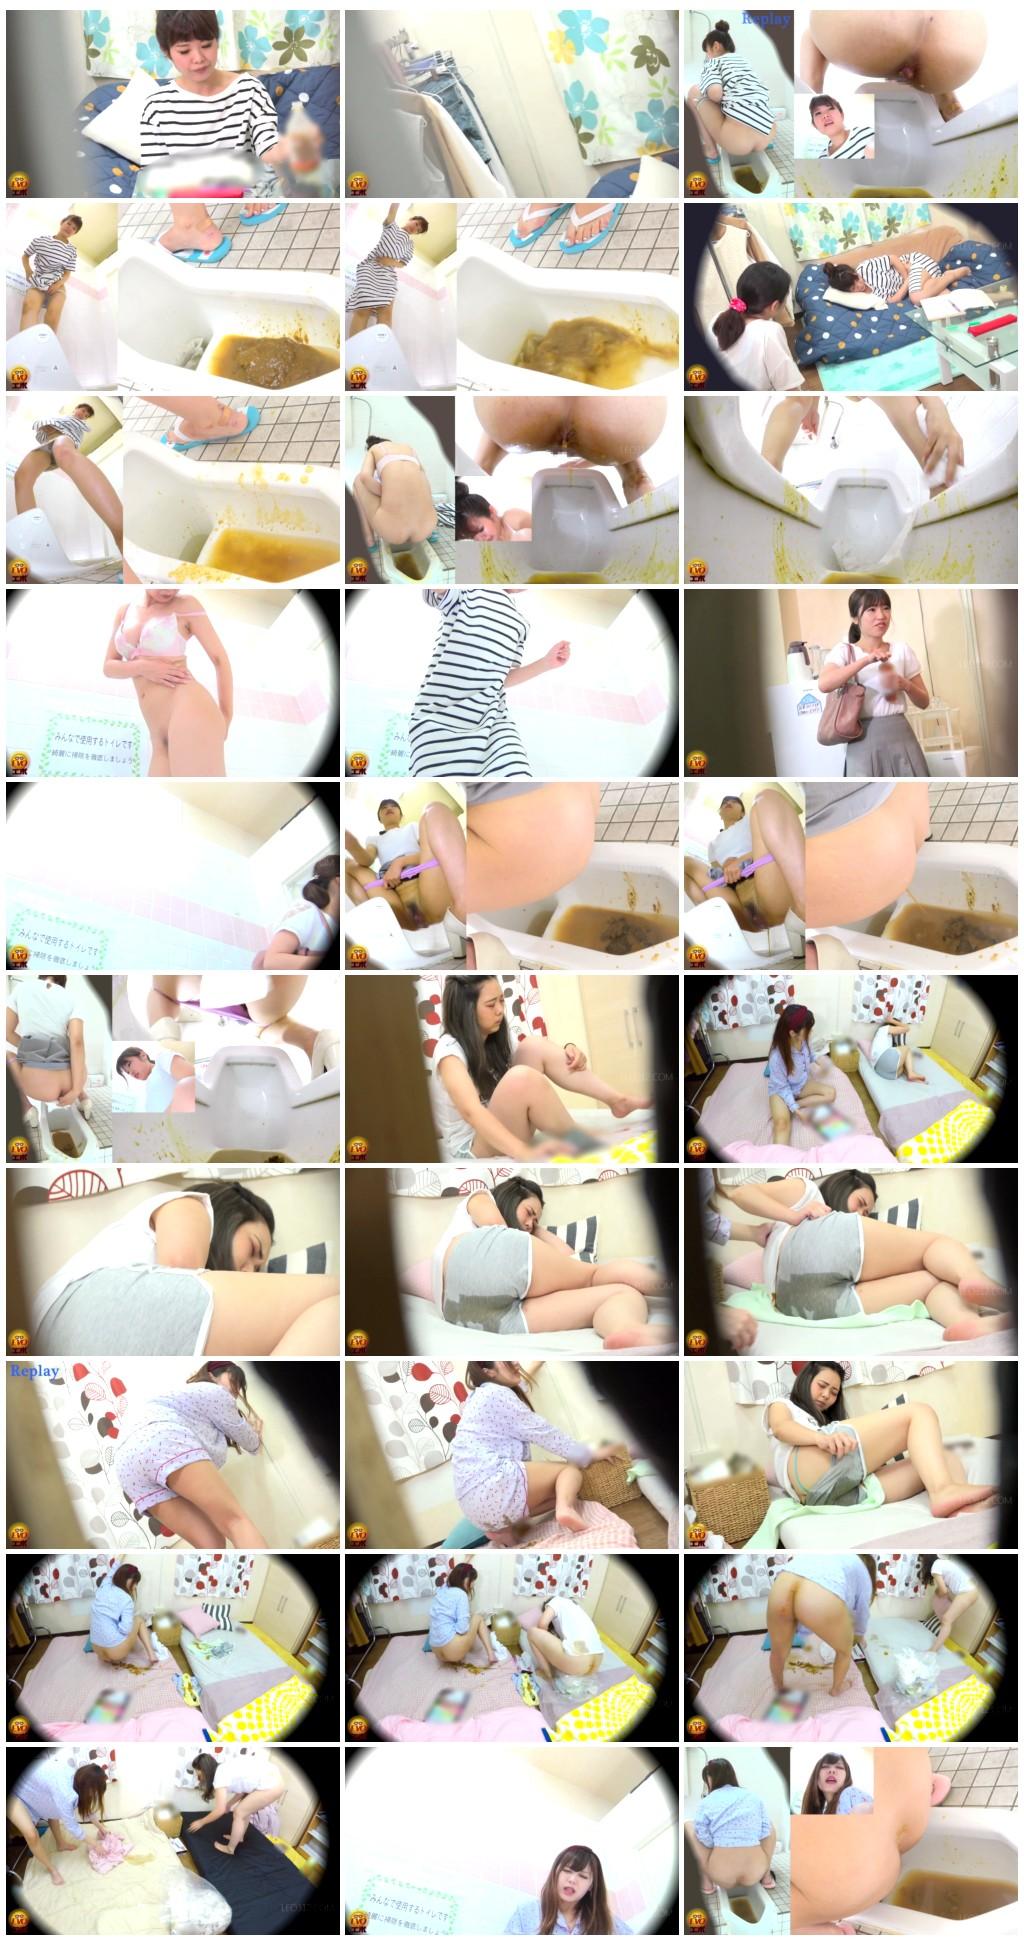 Girls Dormitory Diarrhea Story-319-01